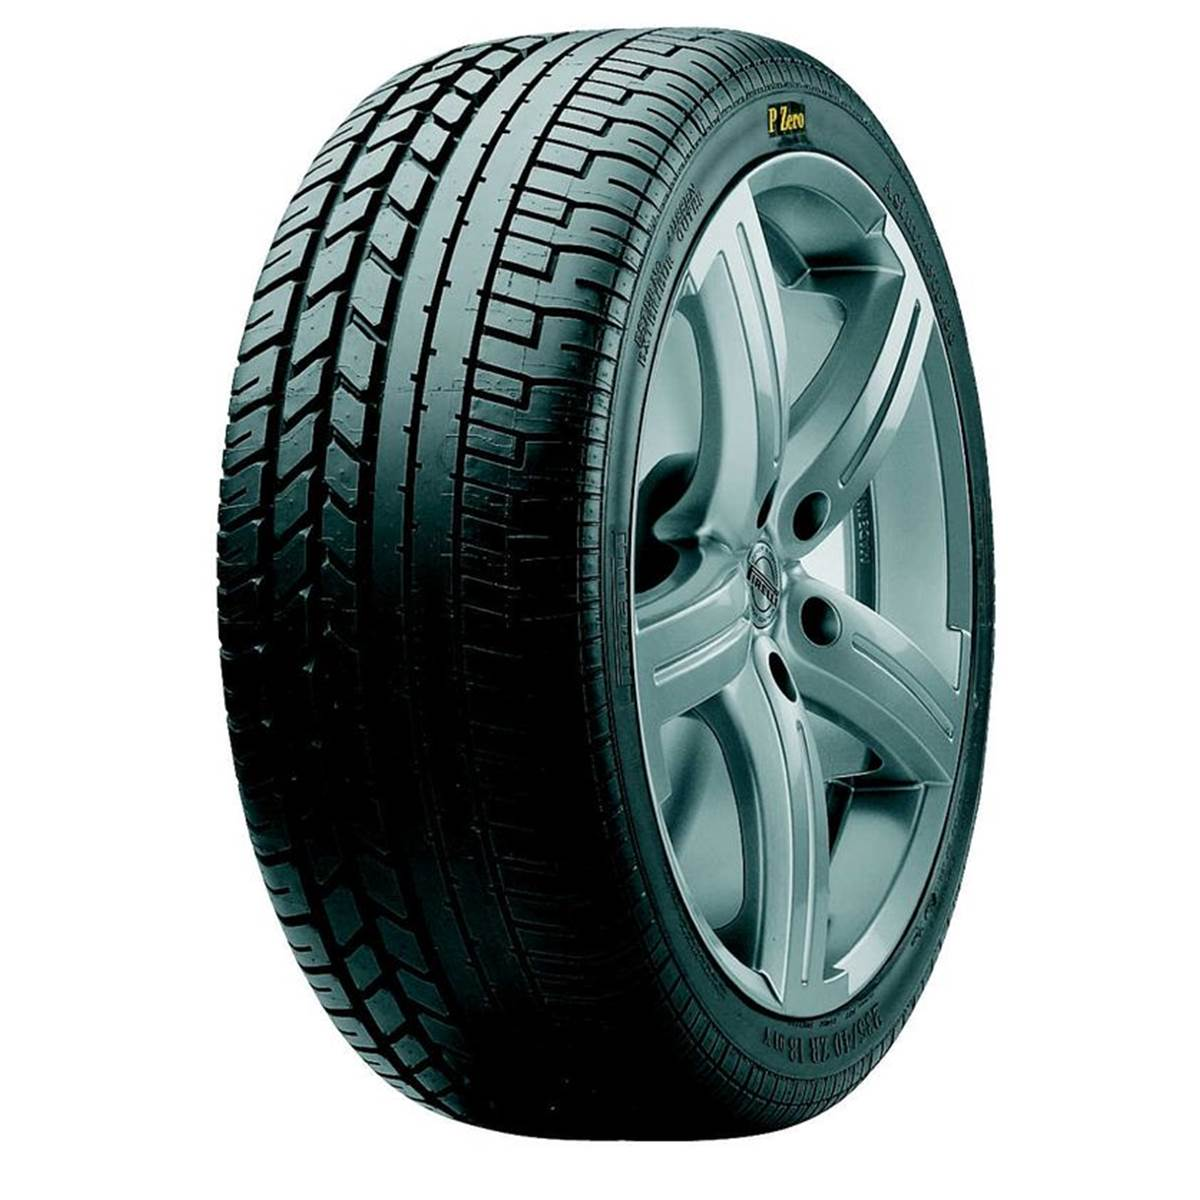 Pneu Pirelli 265/40R18 97Y Pzero Asimmetrico